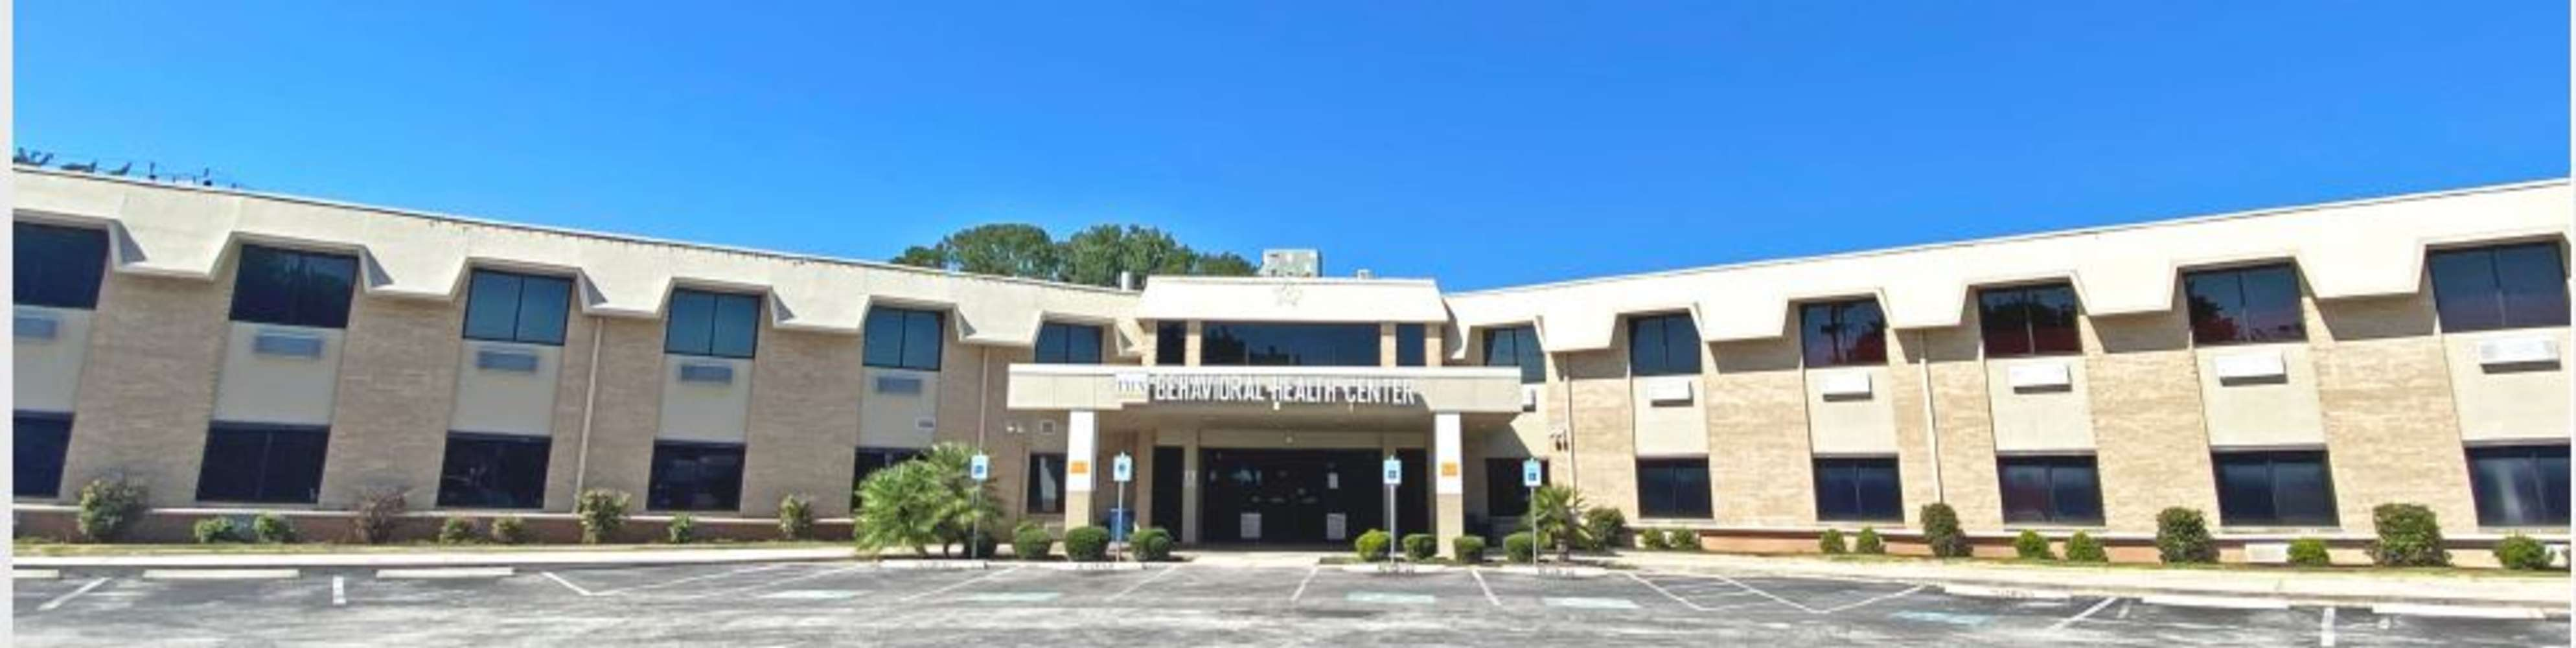 Office San antonio, 78229 - Nix Behavioral Health Center